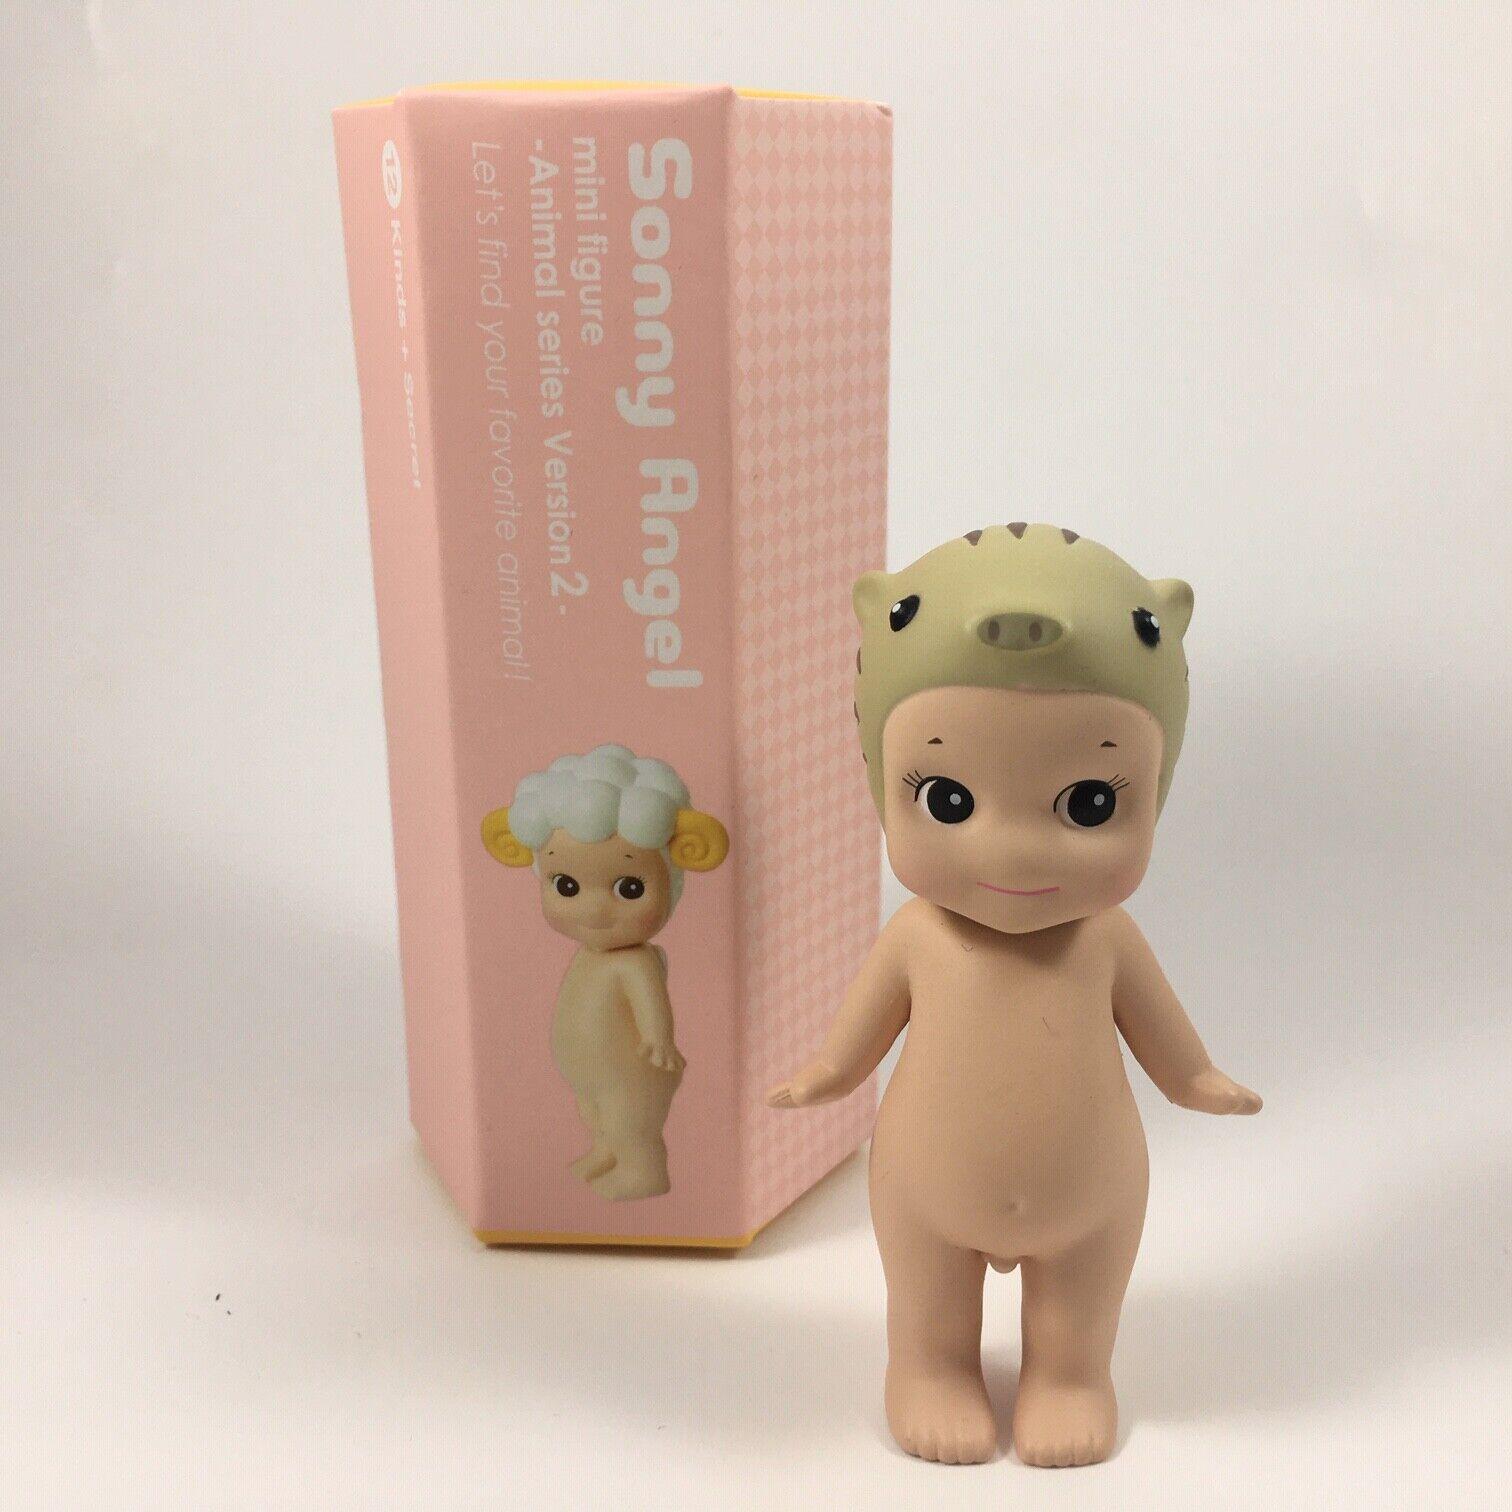 Sonny Angel LOP EAR RABBIT Animal Series 3 Mini Figure Baby Doll Dreams Toys